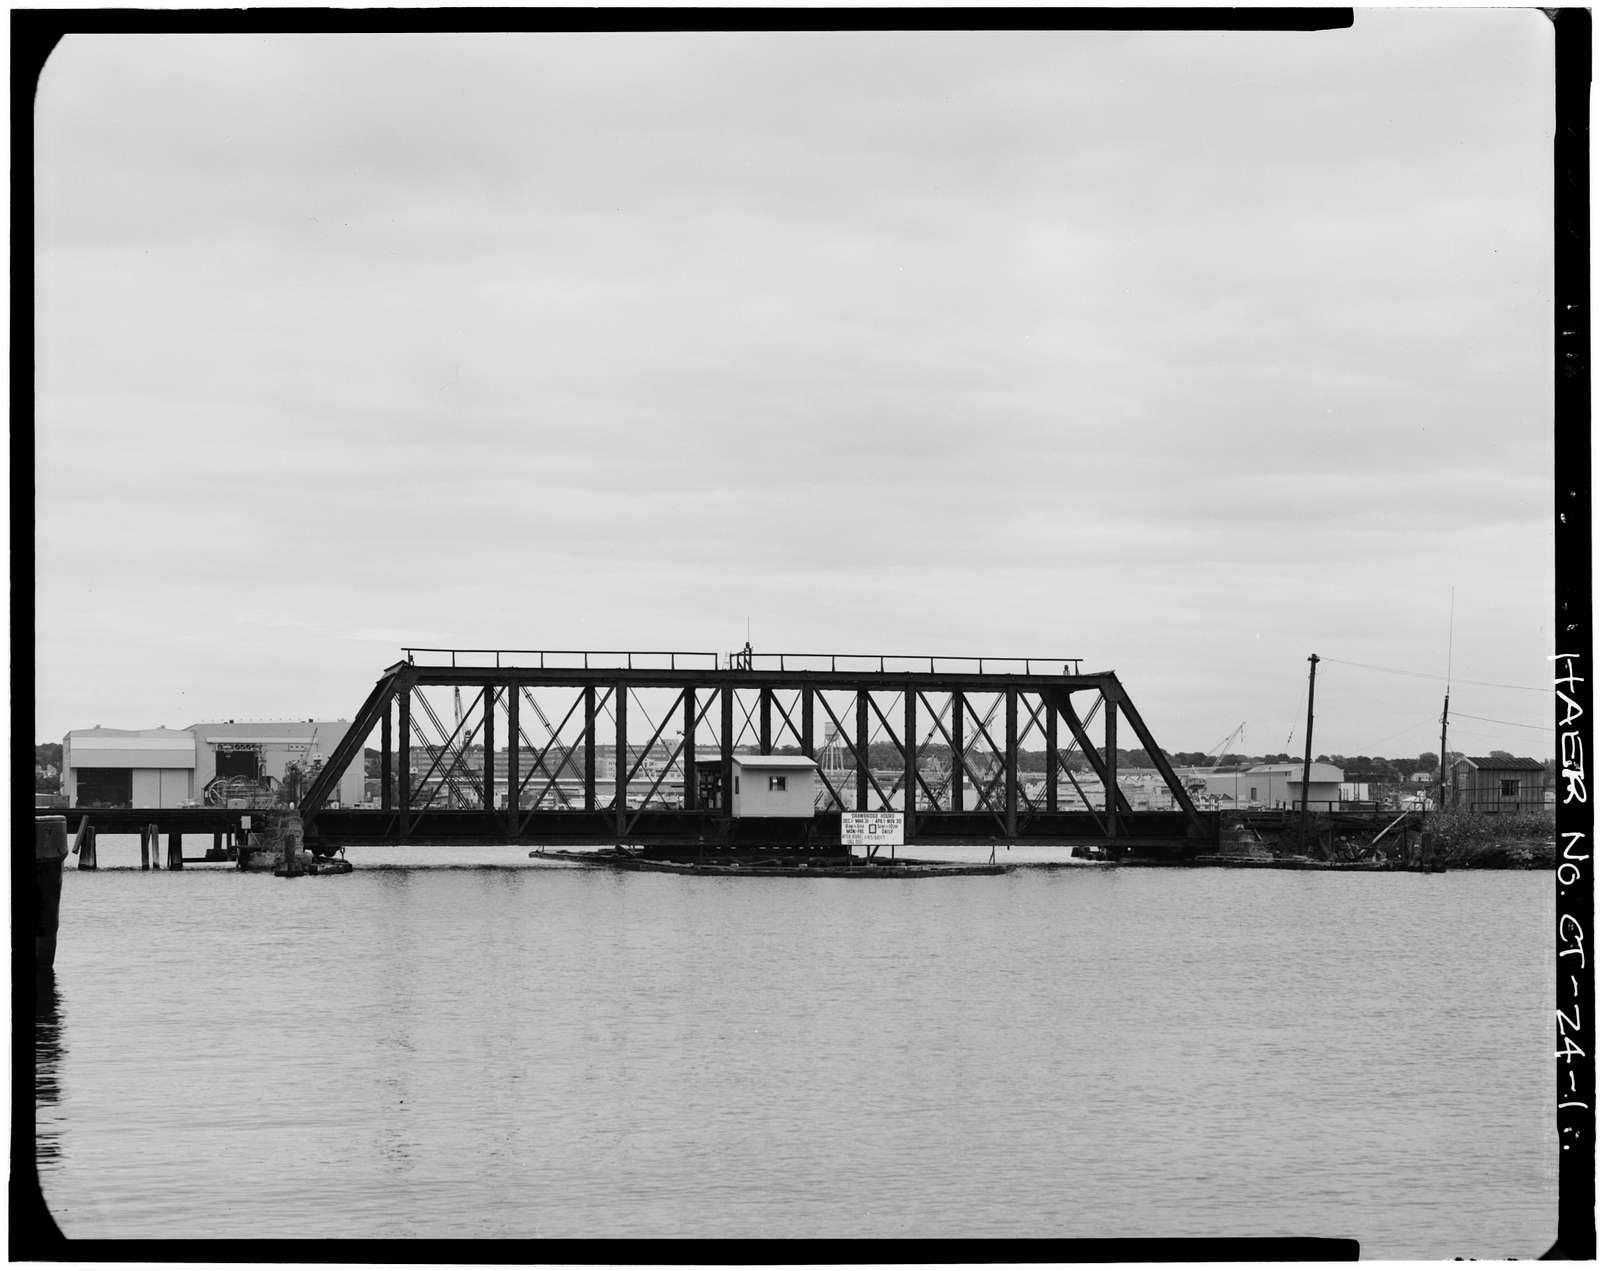 New York, New Haven & Hartford Railroad, Shaw's Cove Bridge, Spanning Shaw's Cove, New London, New London County, CT